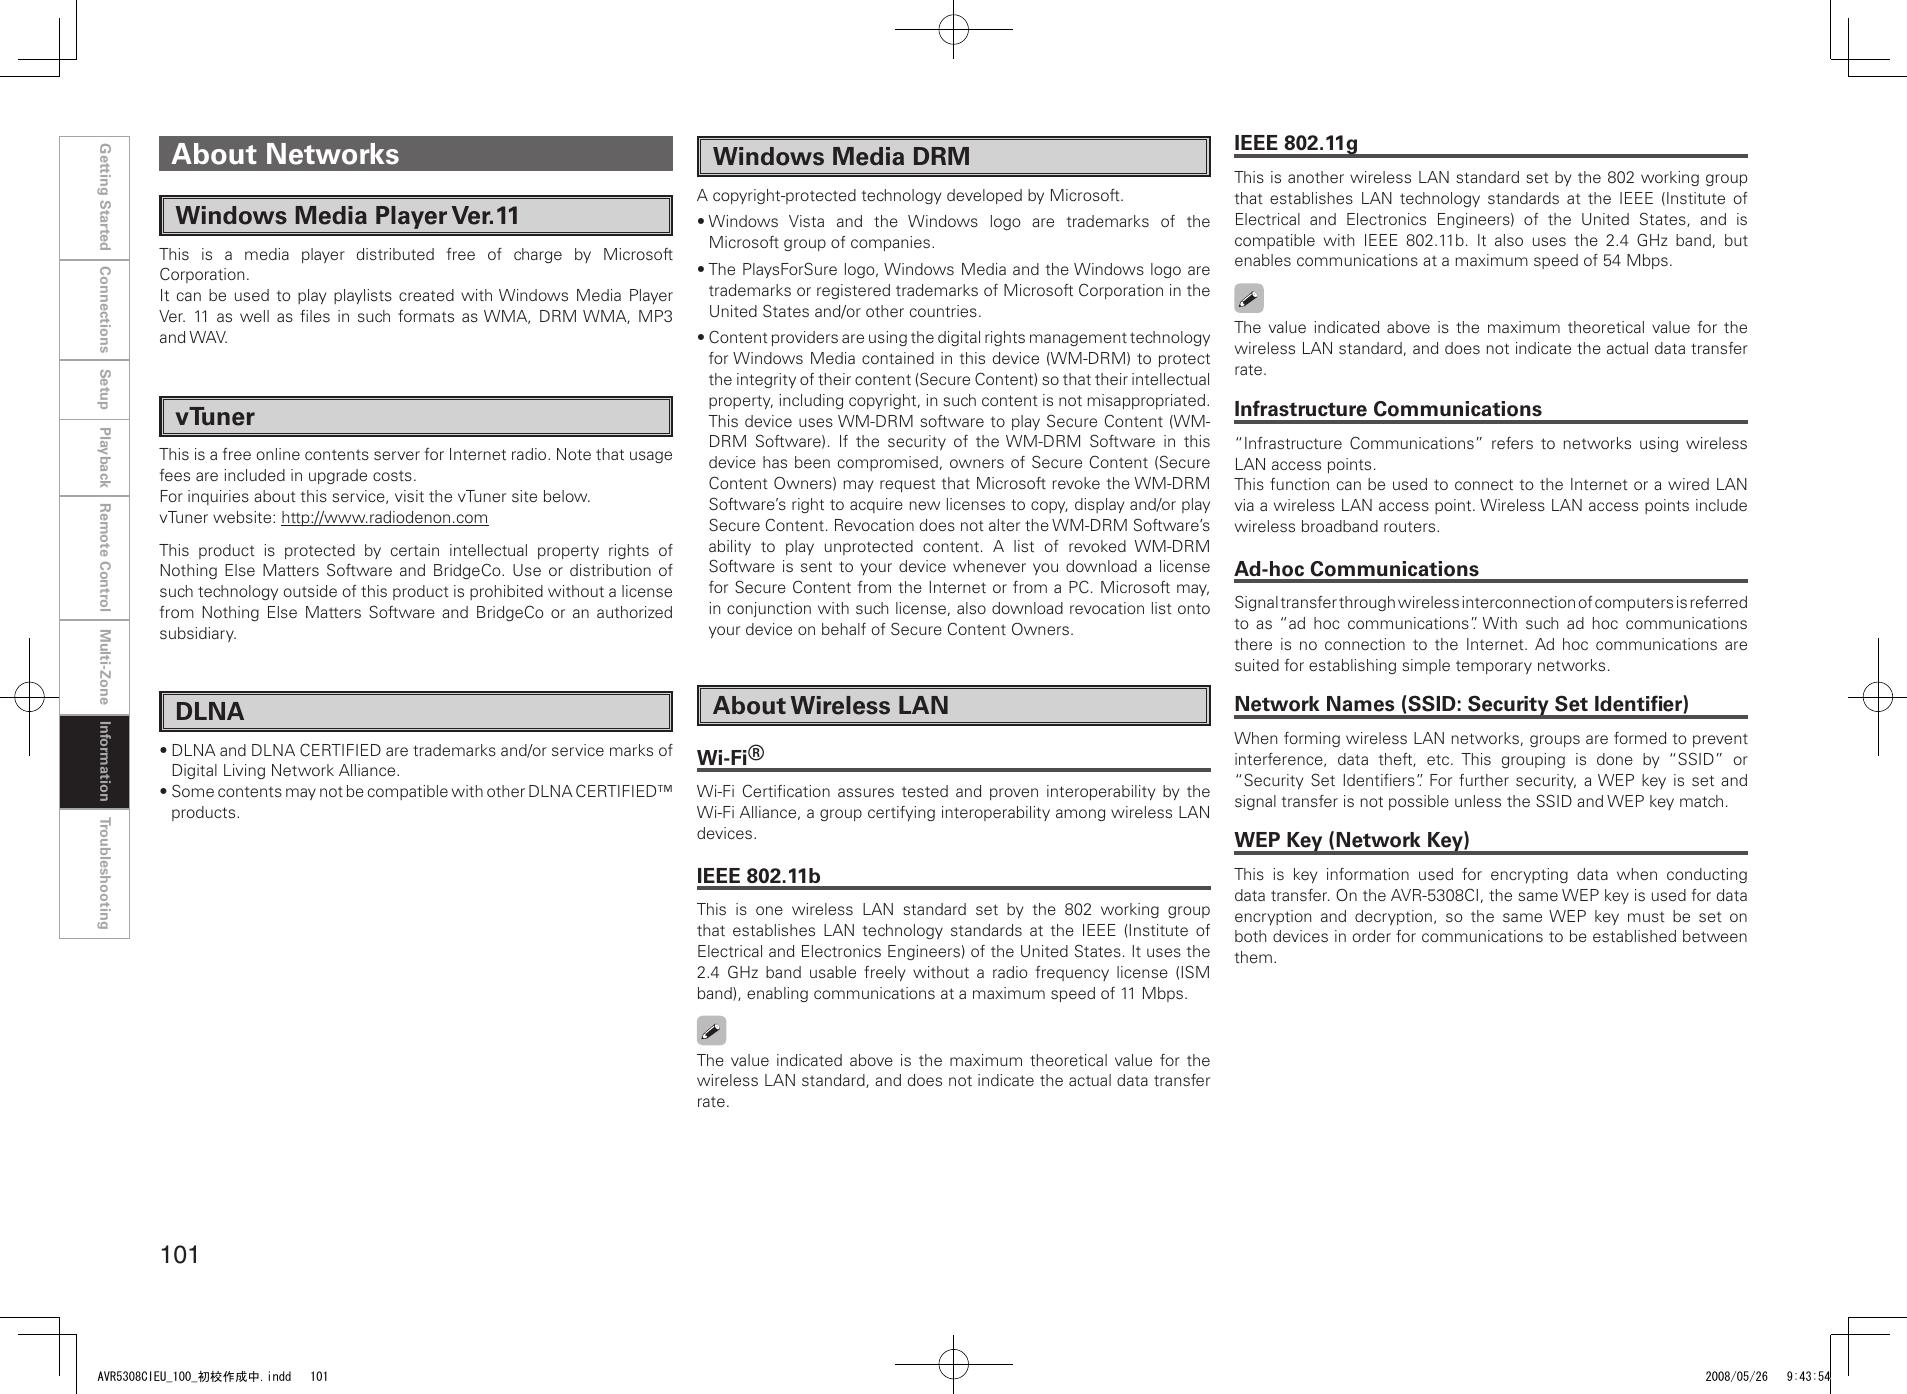 Denon Av Surround Receiver Avr 5308Ci Users Manual AVR5308CIEU_100_